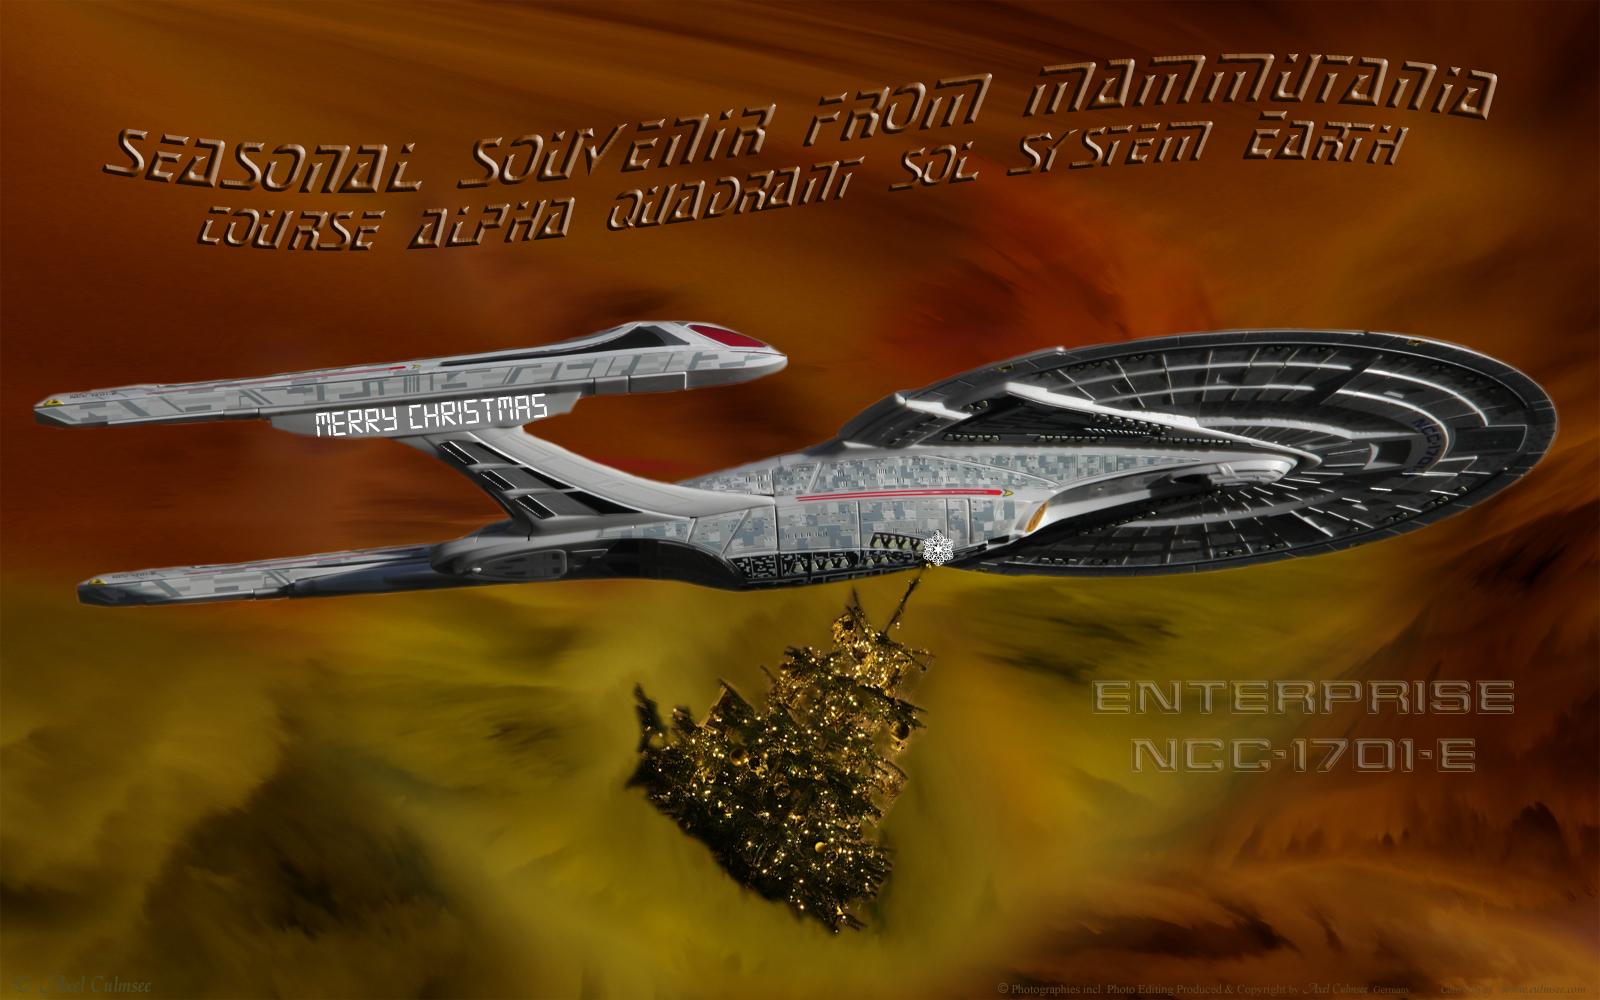 Enterprise-E NCC-1701-E seasonal souvenir from Mammutania course Alpha quadrant sol system Earth